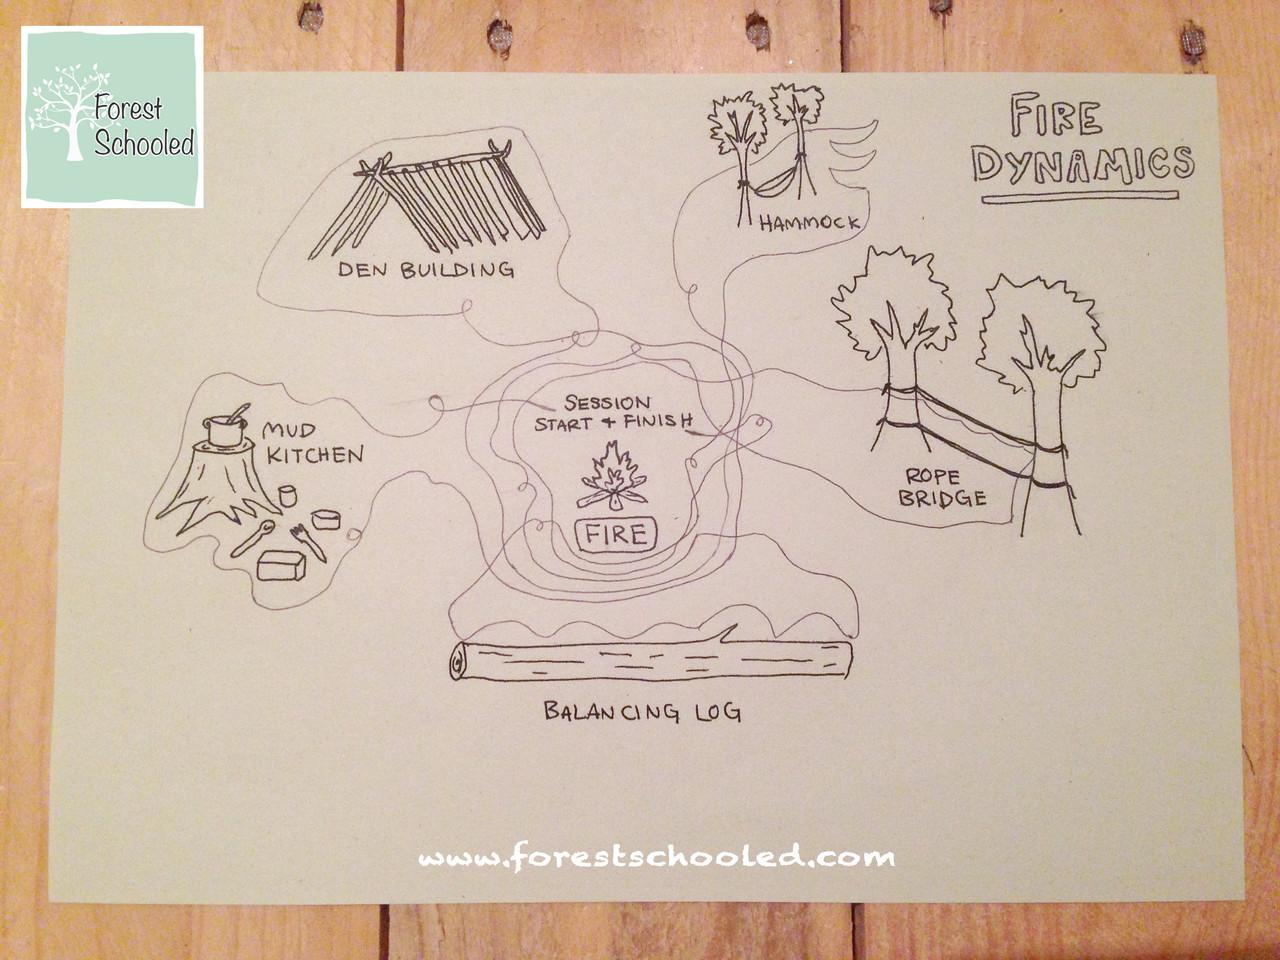 Fire Dynamics3 (fire)